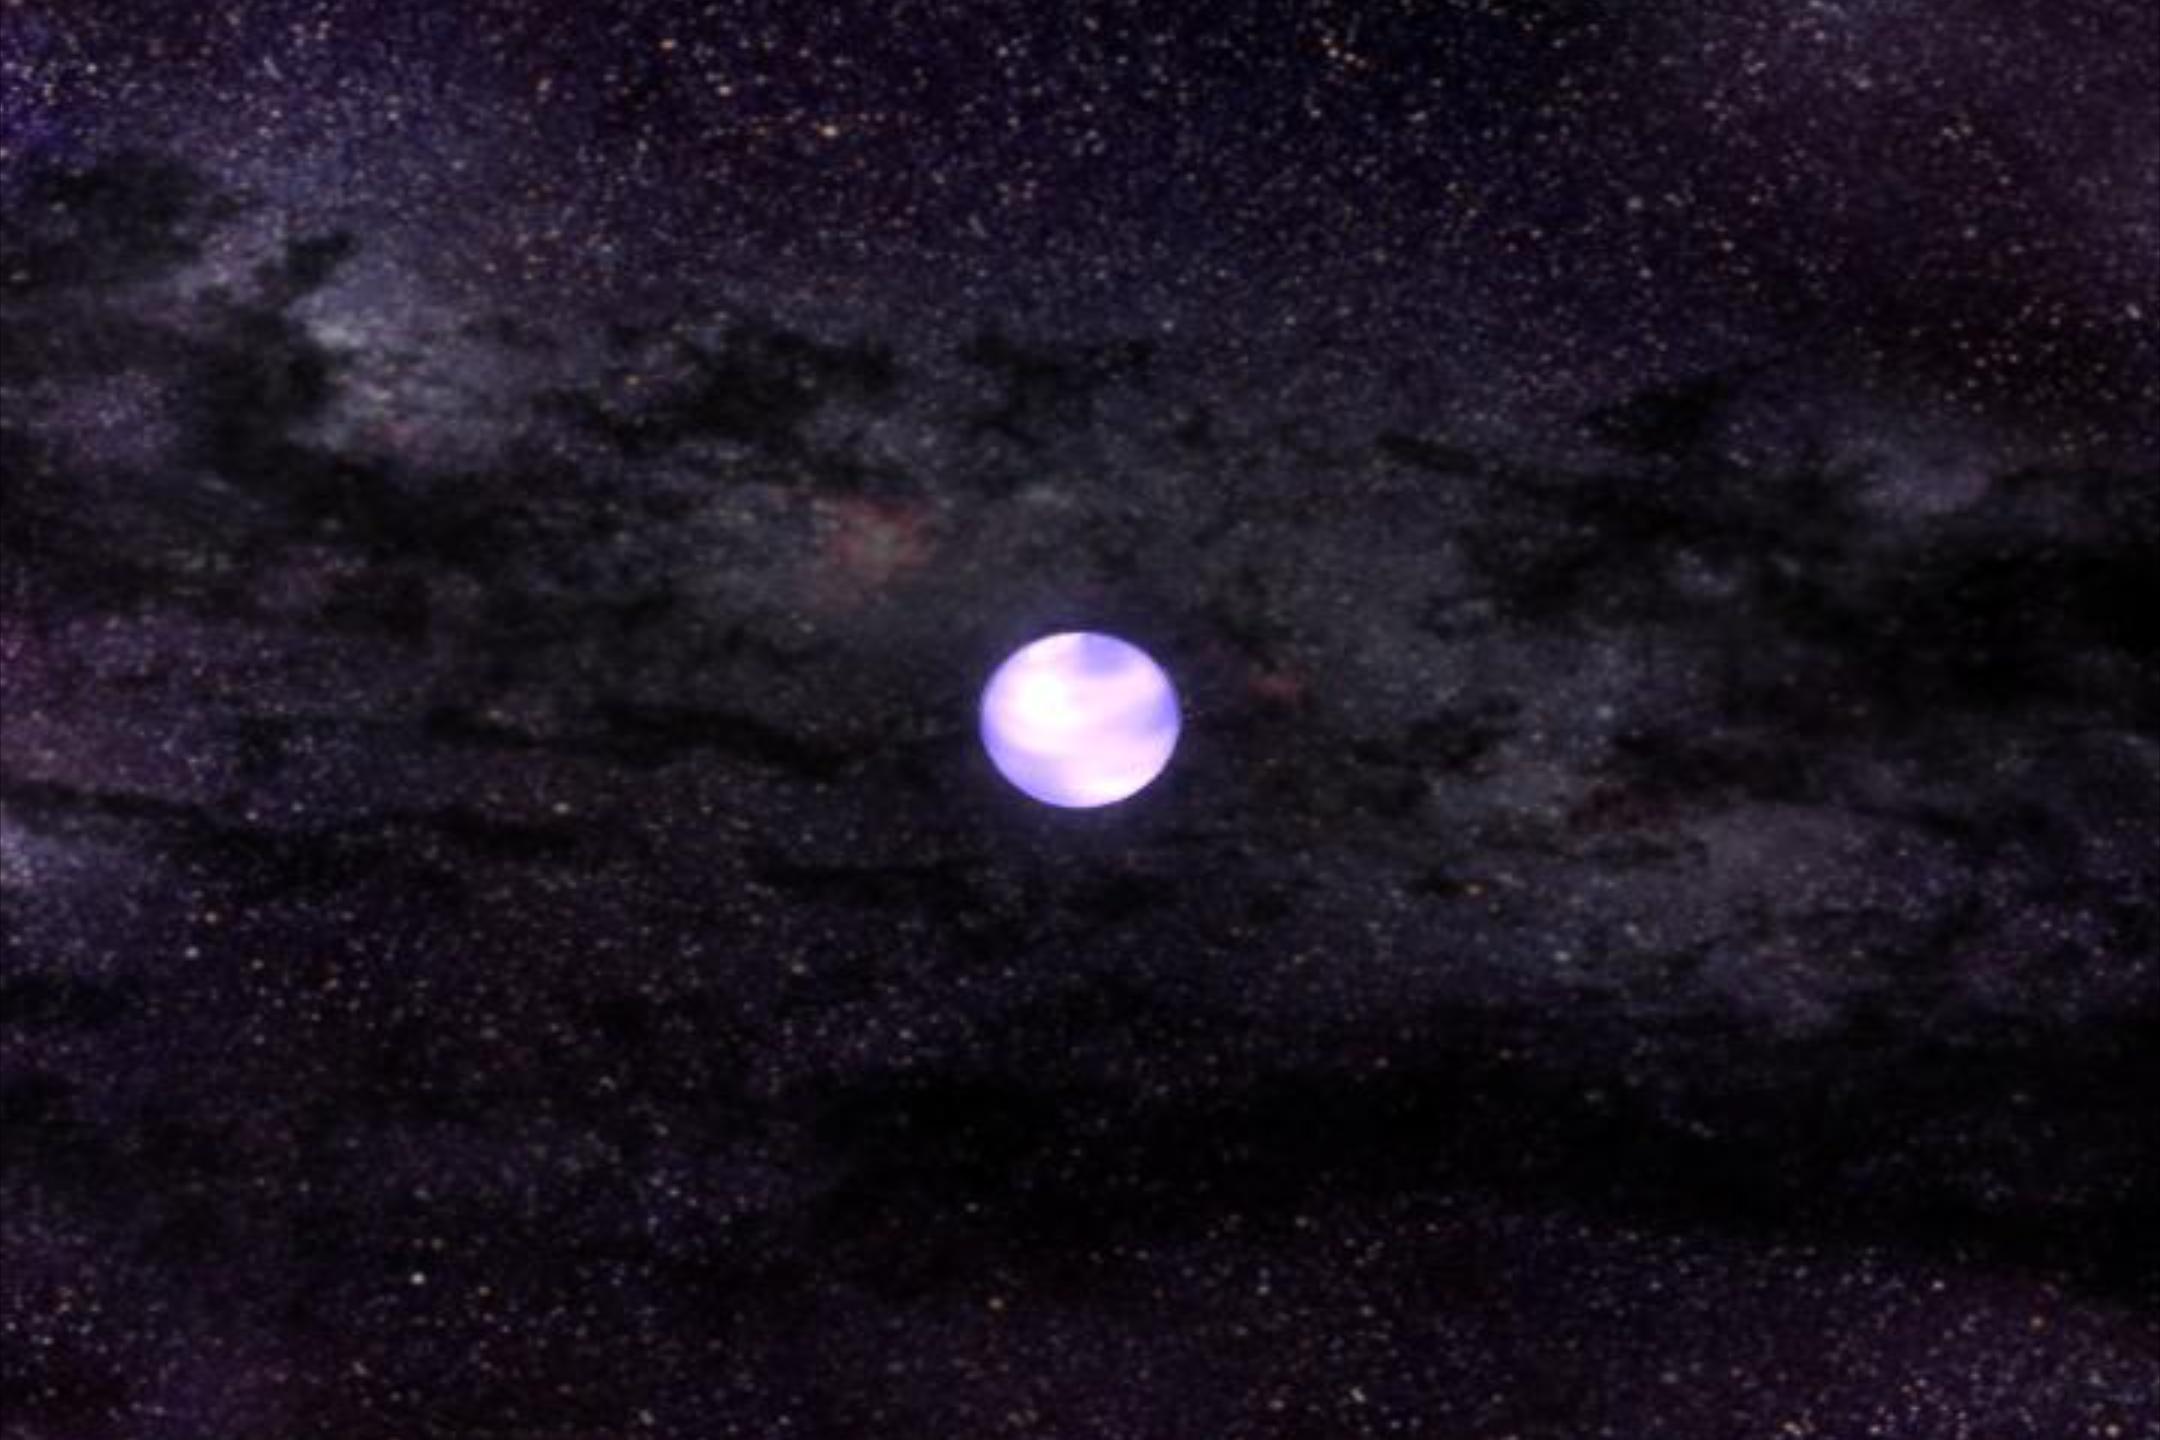 white dwarfs in space - photo #24